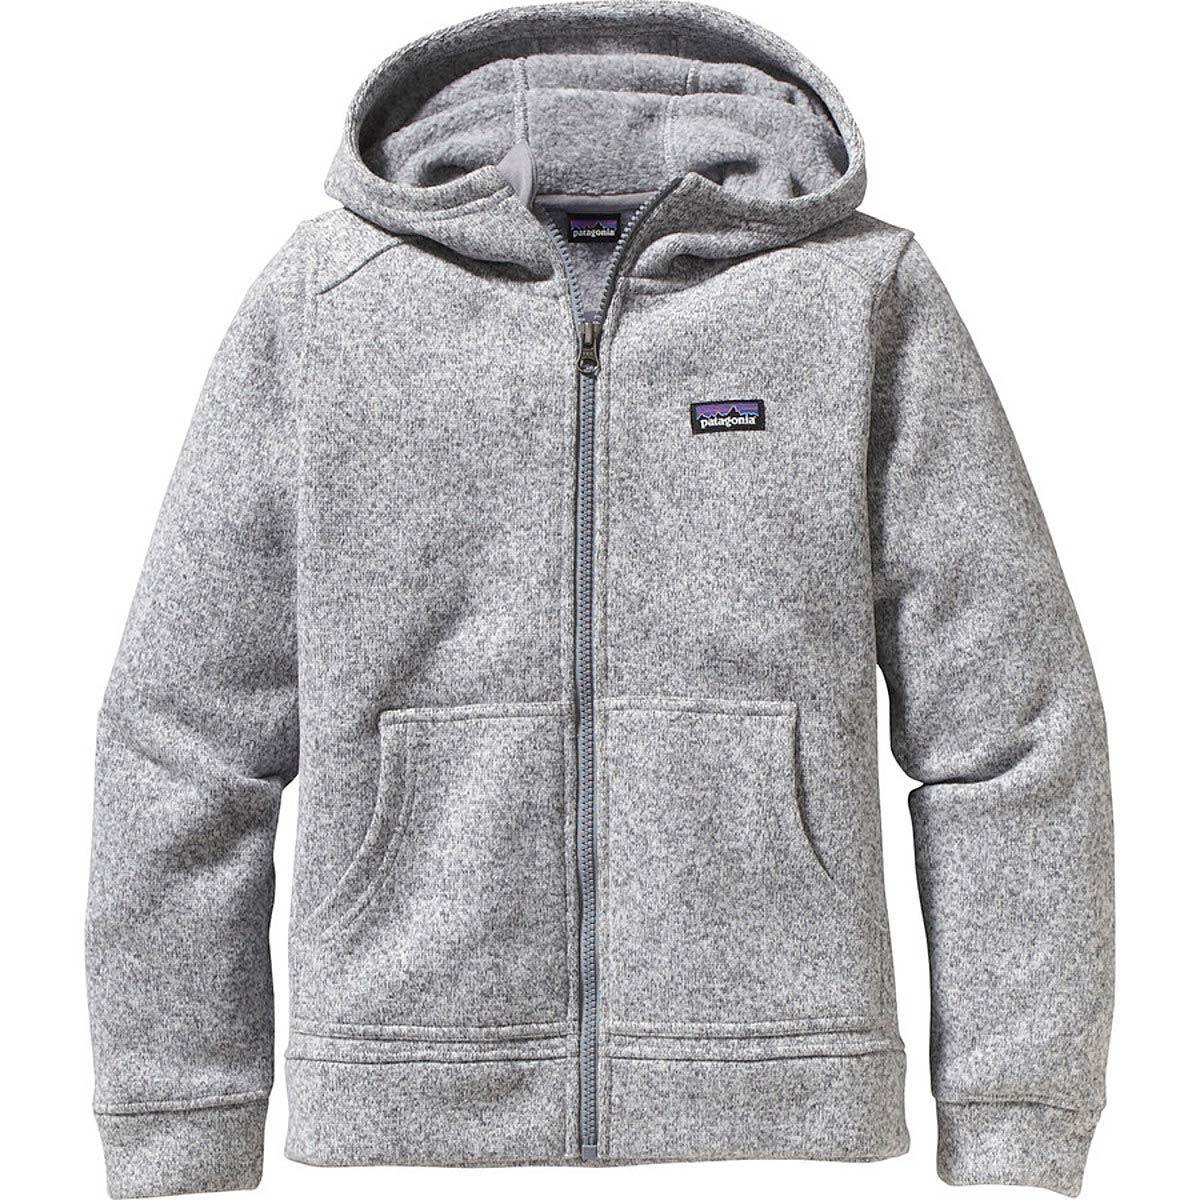 Better Sweater Hoody Patagonia